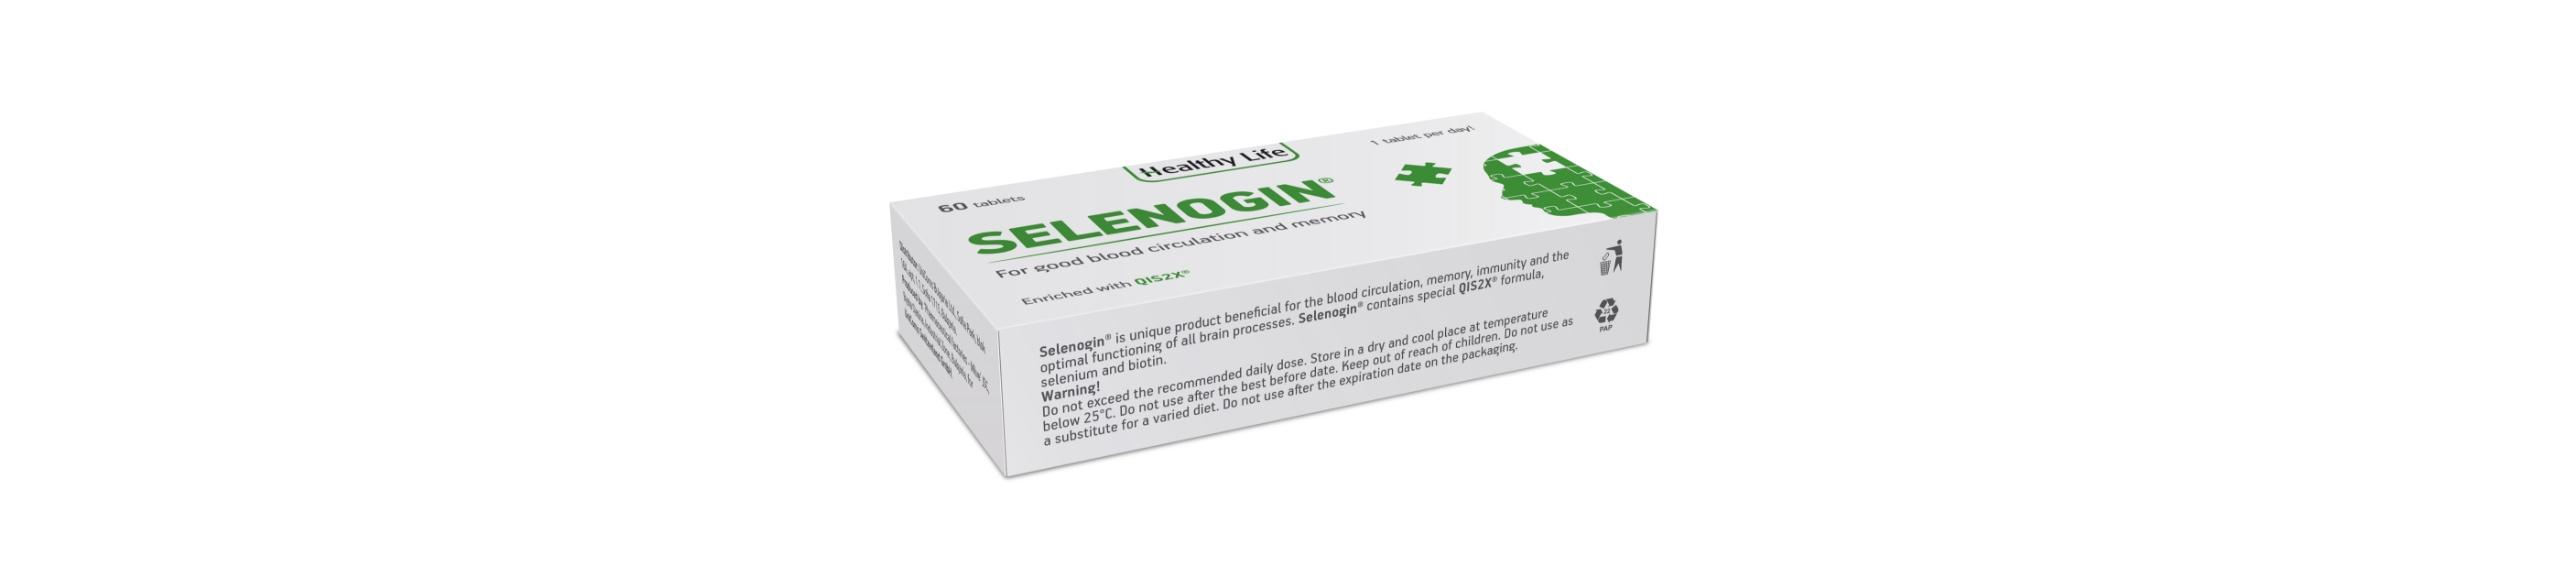 P3-Slider-img-Selenogin3